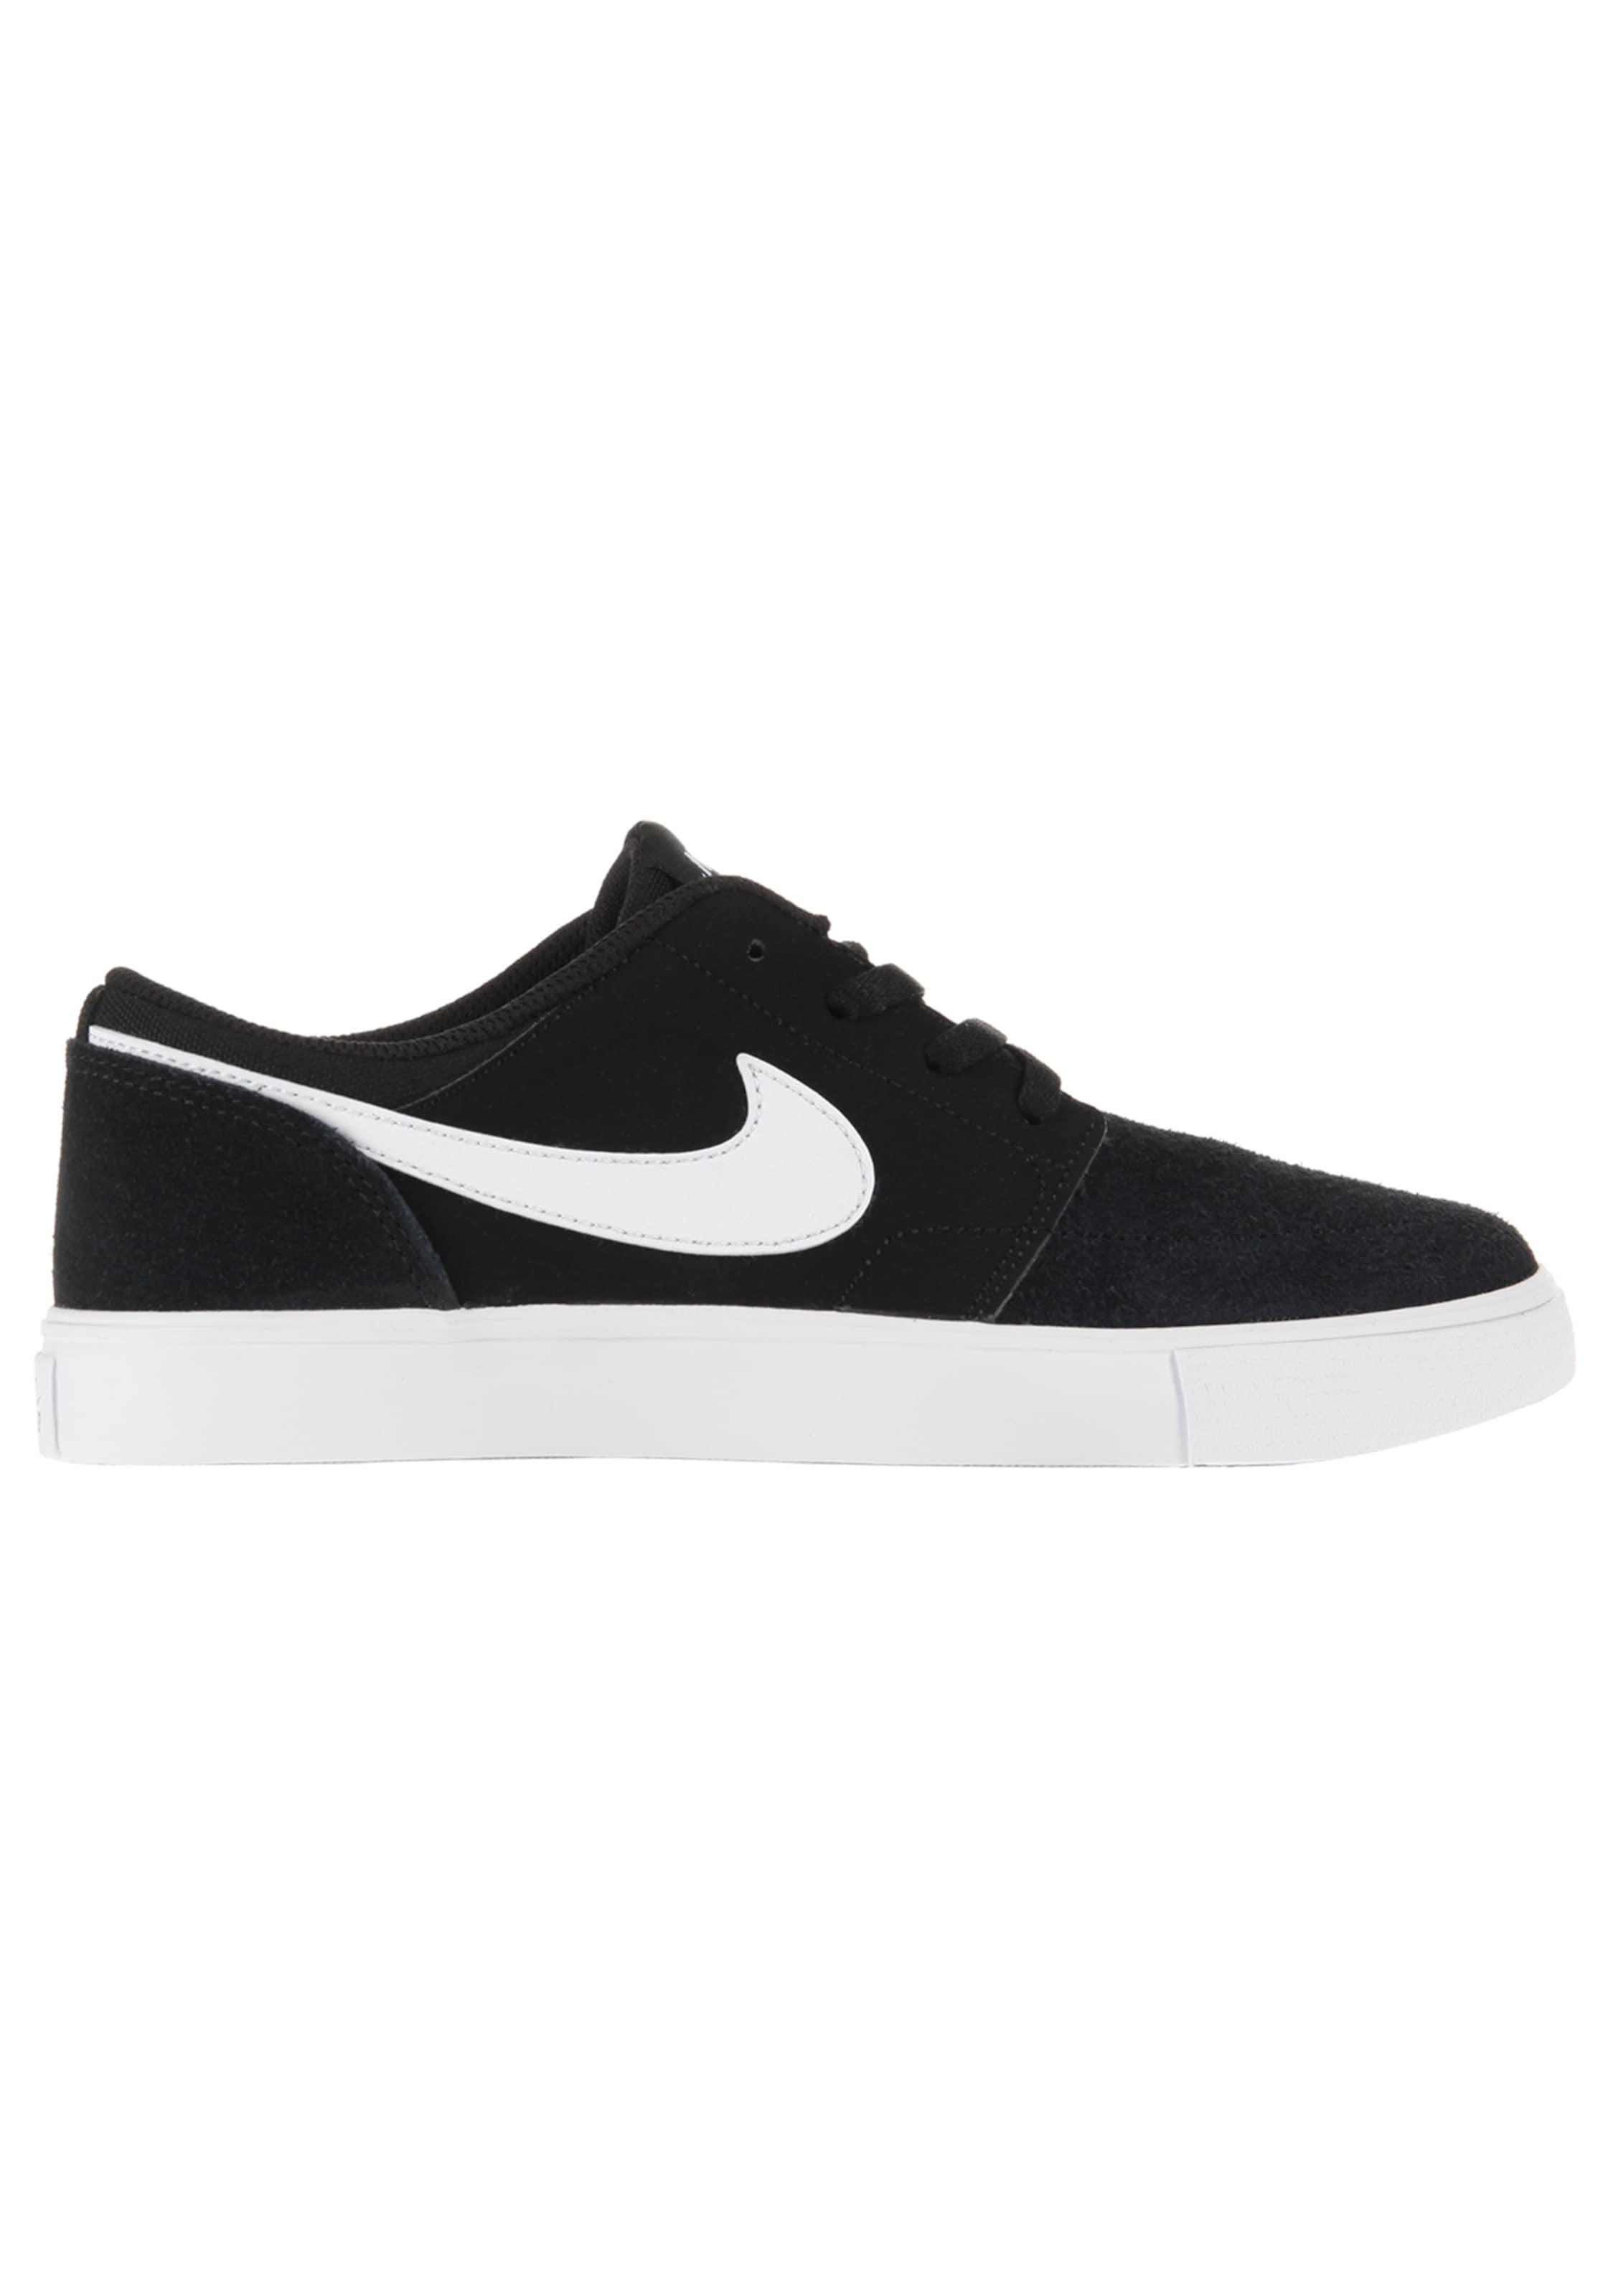 Nike SB Portmore II Sneaker